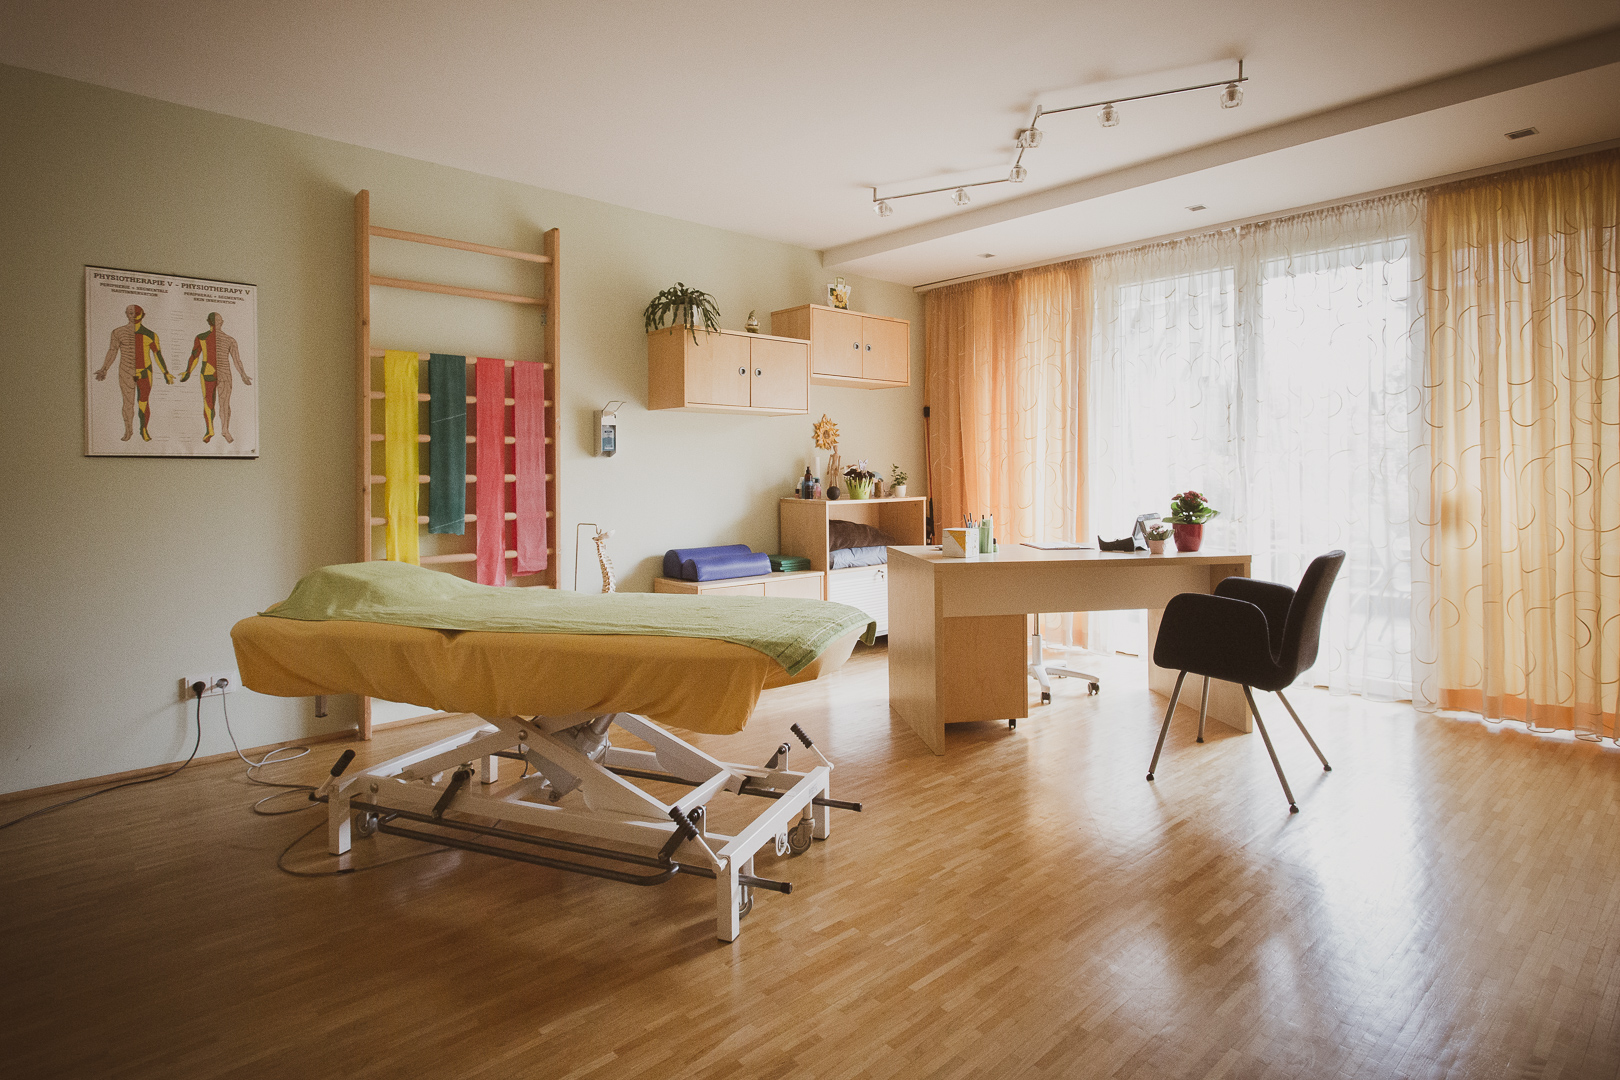 2019_05_22 Praxisraeume Physiotherapie Floridsdorf web 047